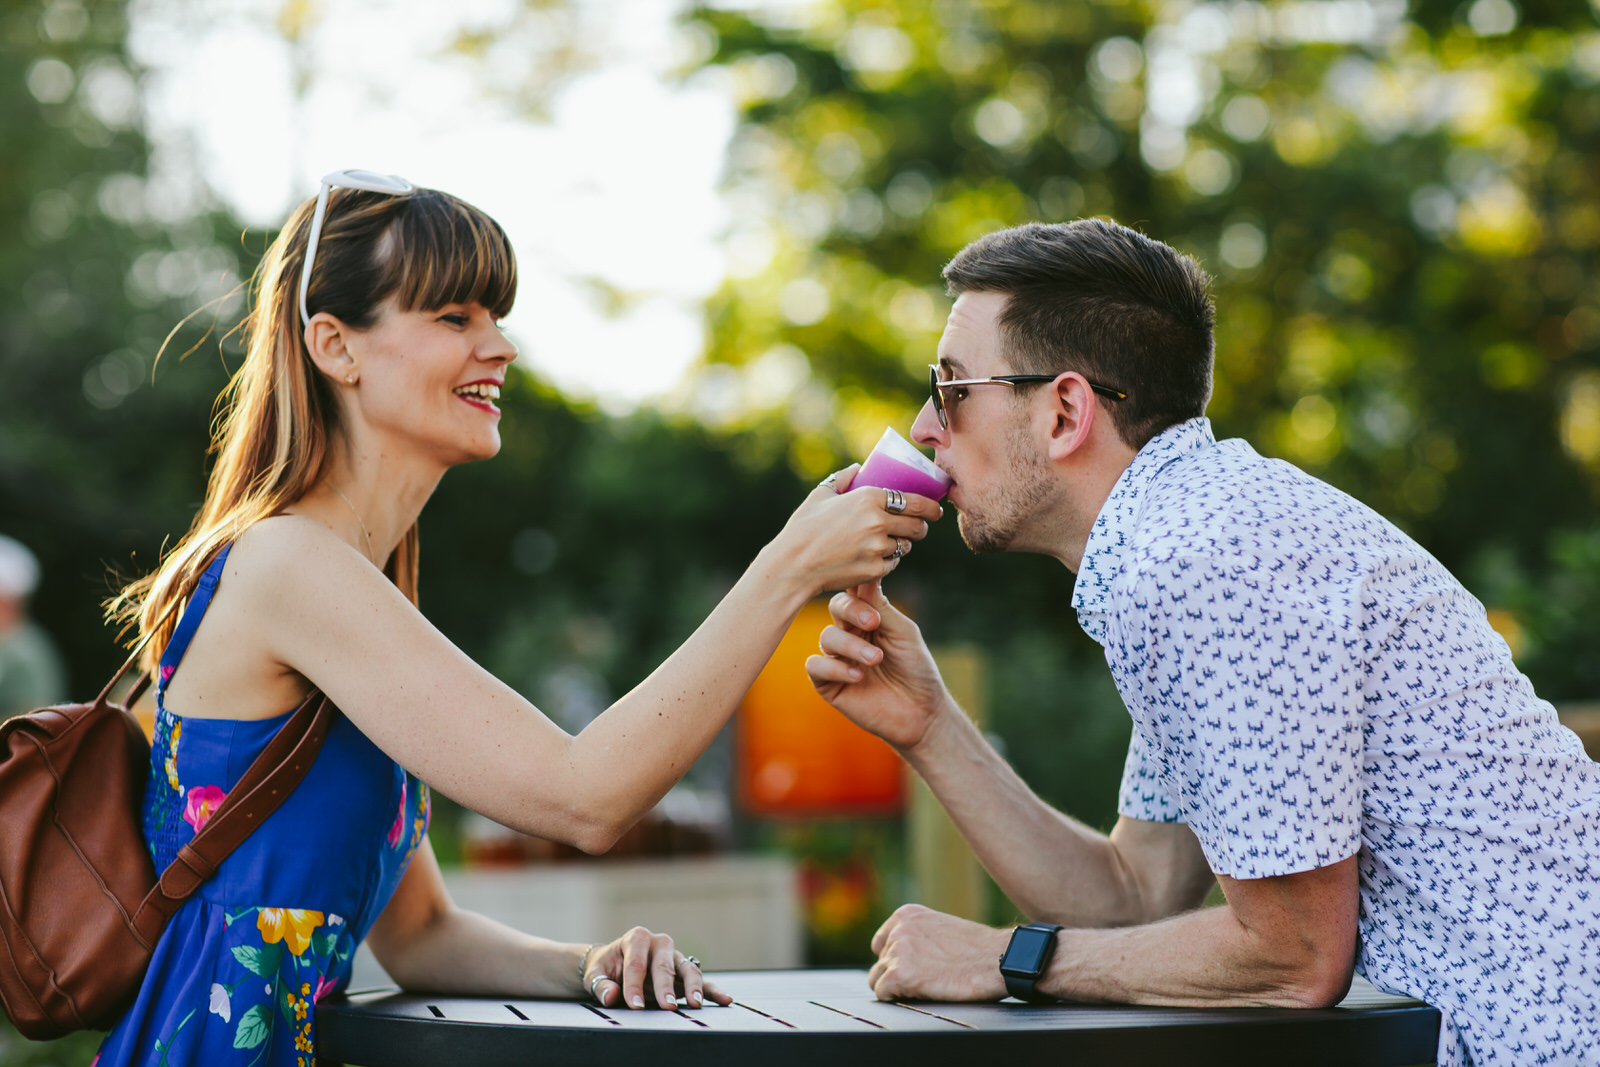 Adorable-Engagement-Session-Epcot-Orlando-Tiny-House-Photo-Wedding-Photographer-23.jpg